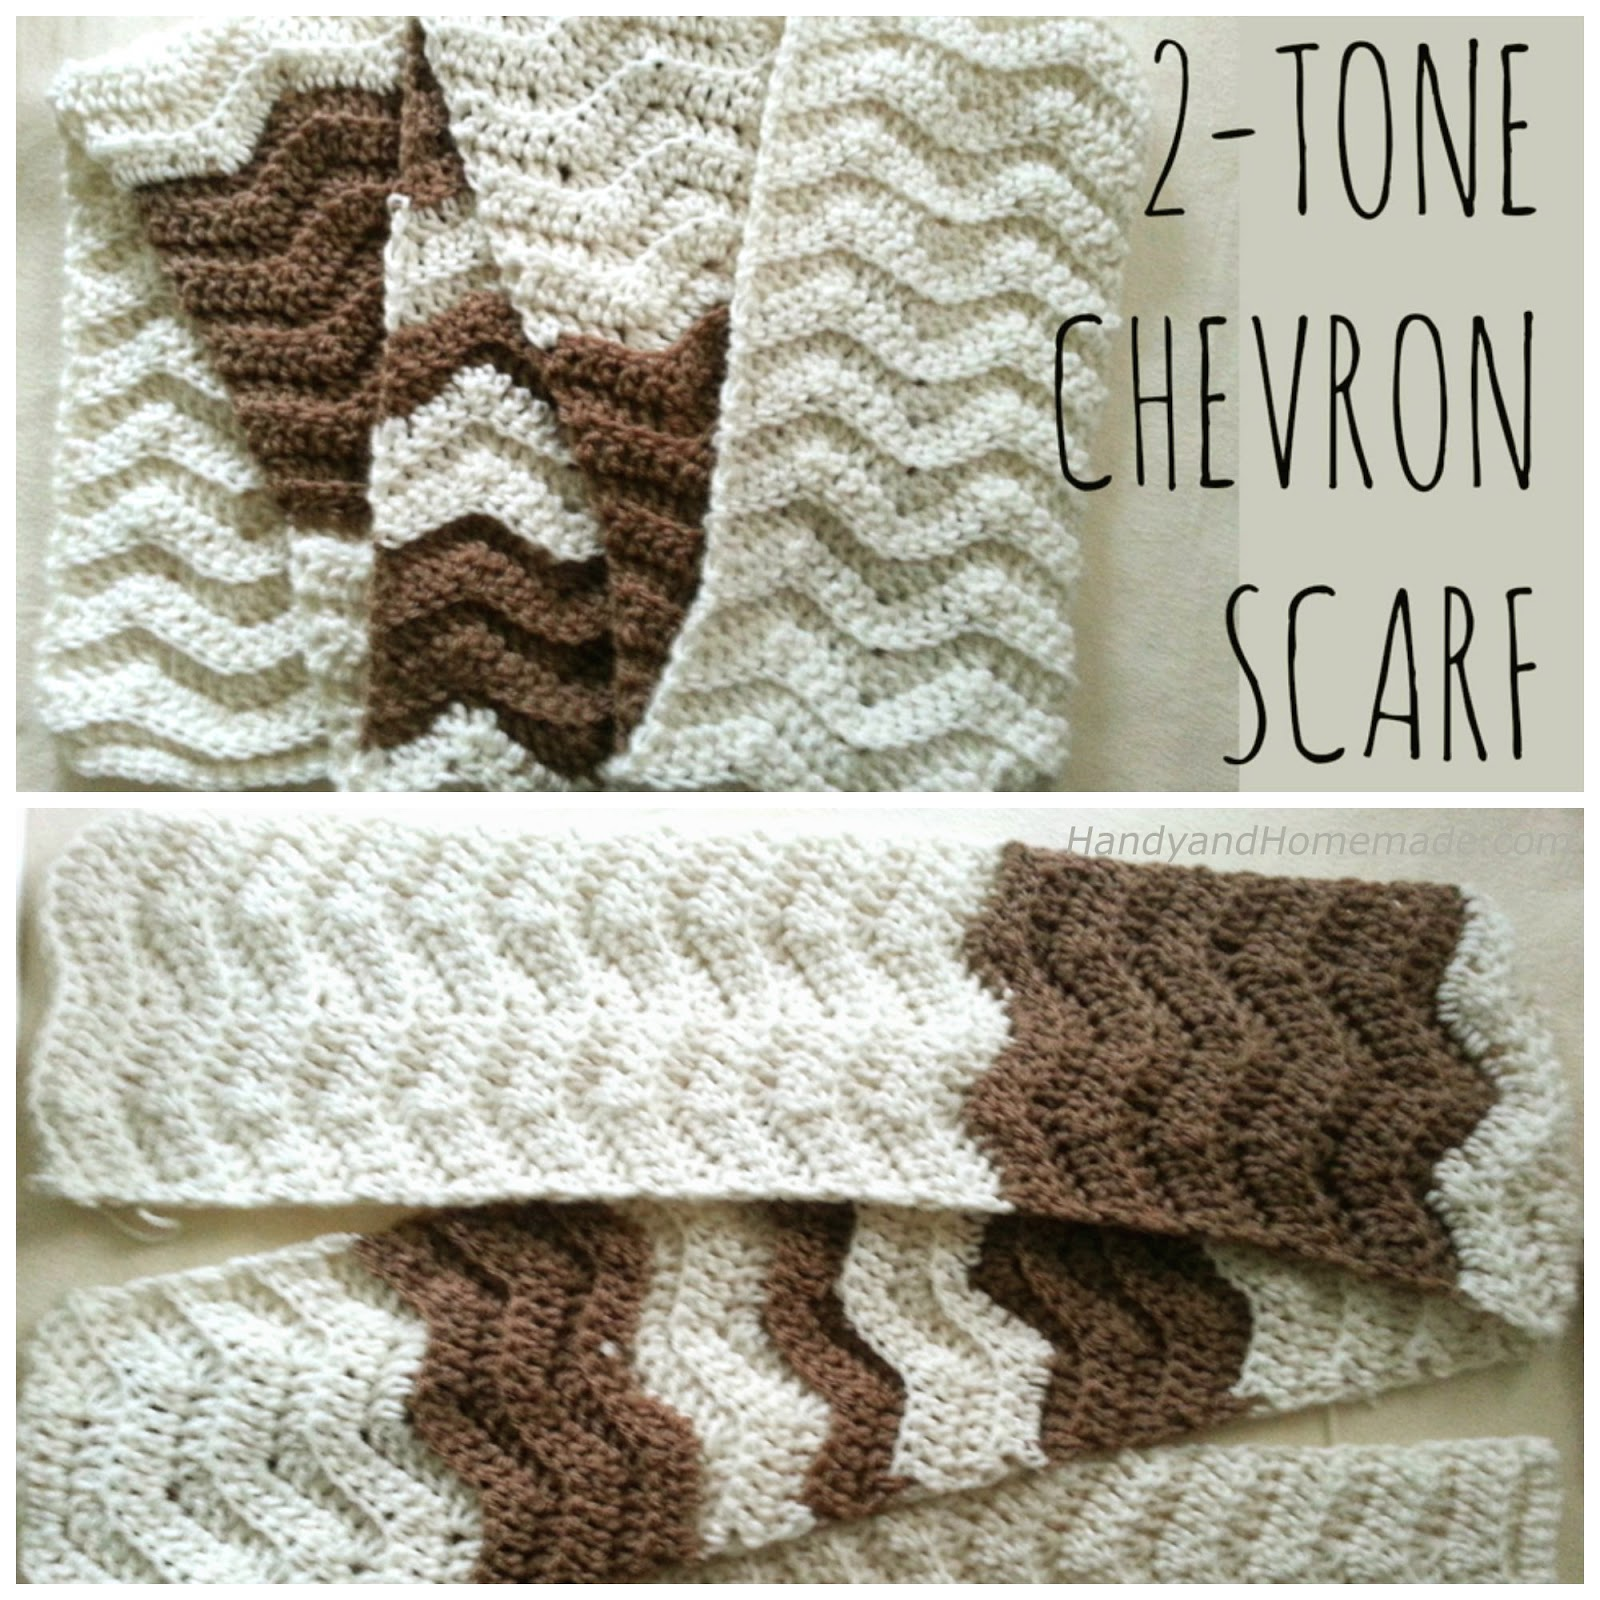 2 Tone Chevron Scarf Crochet Pattern Handy Homemade